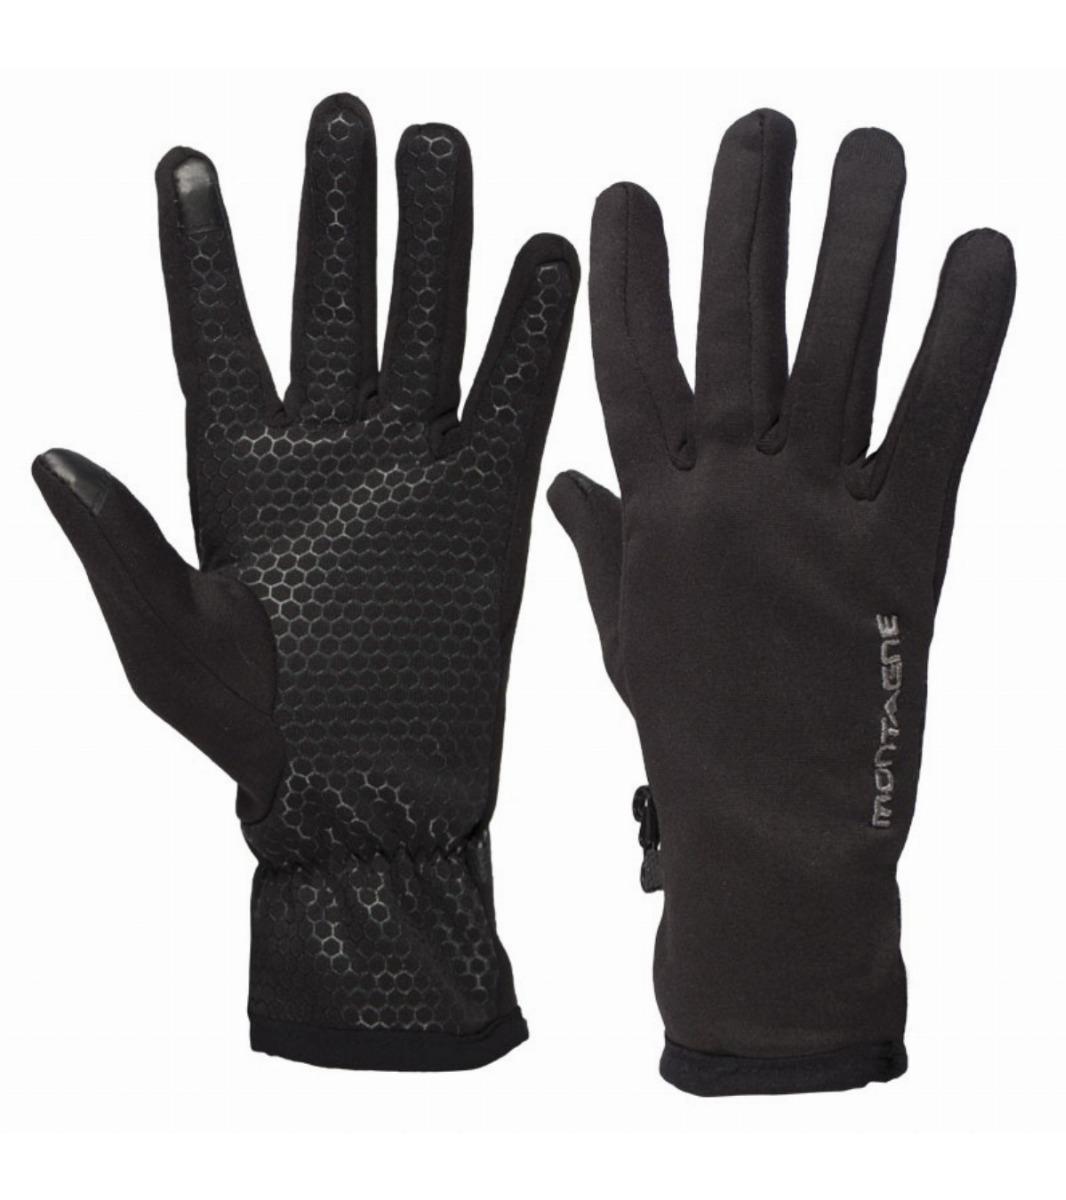 171dbce4b7b guantes térmicos urbanos eiker montagne con touch screen. Cargando zoom.